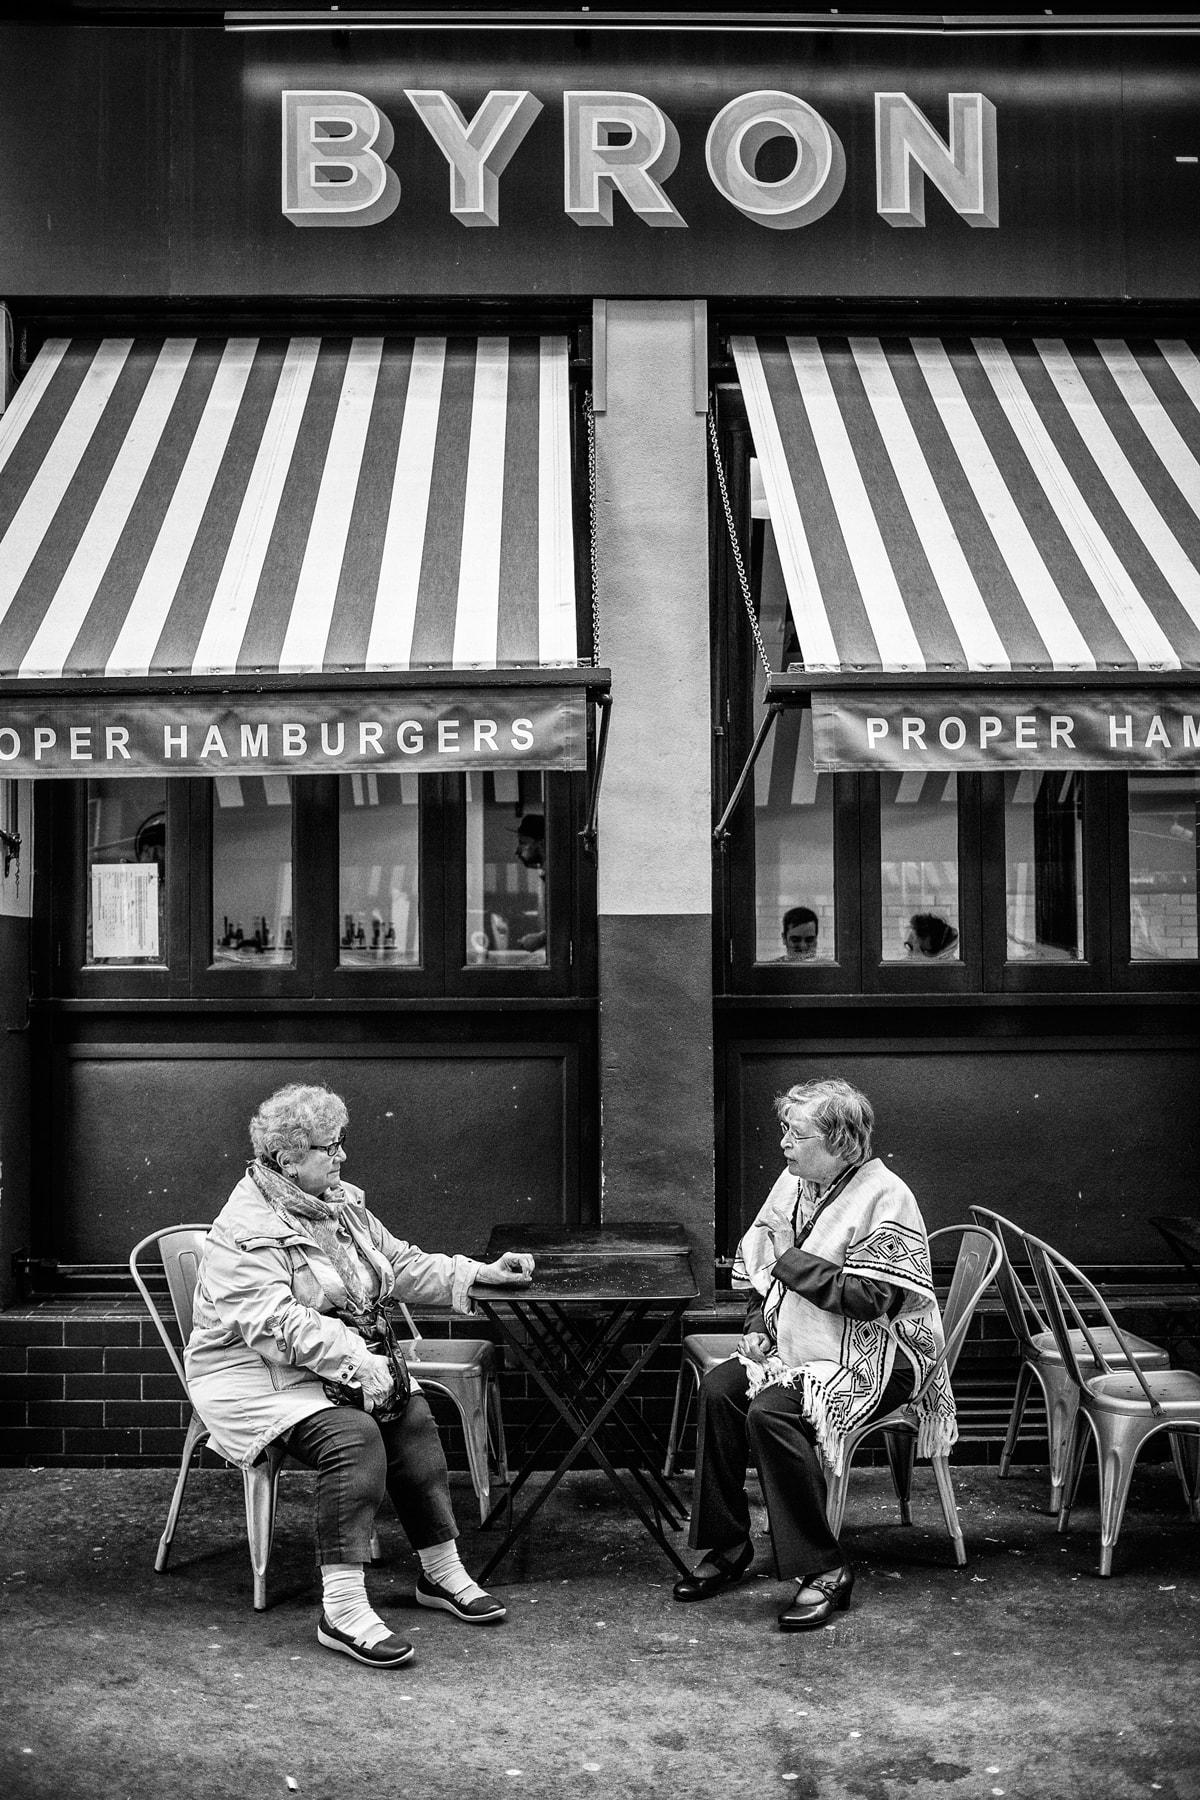 street-documentary-photography-fabio-burrelli-23.jpg